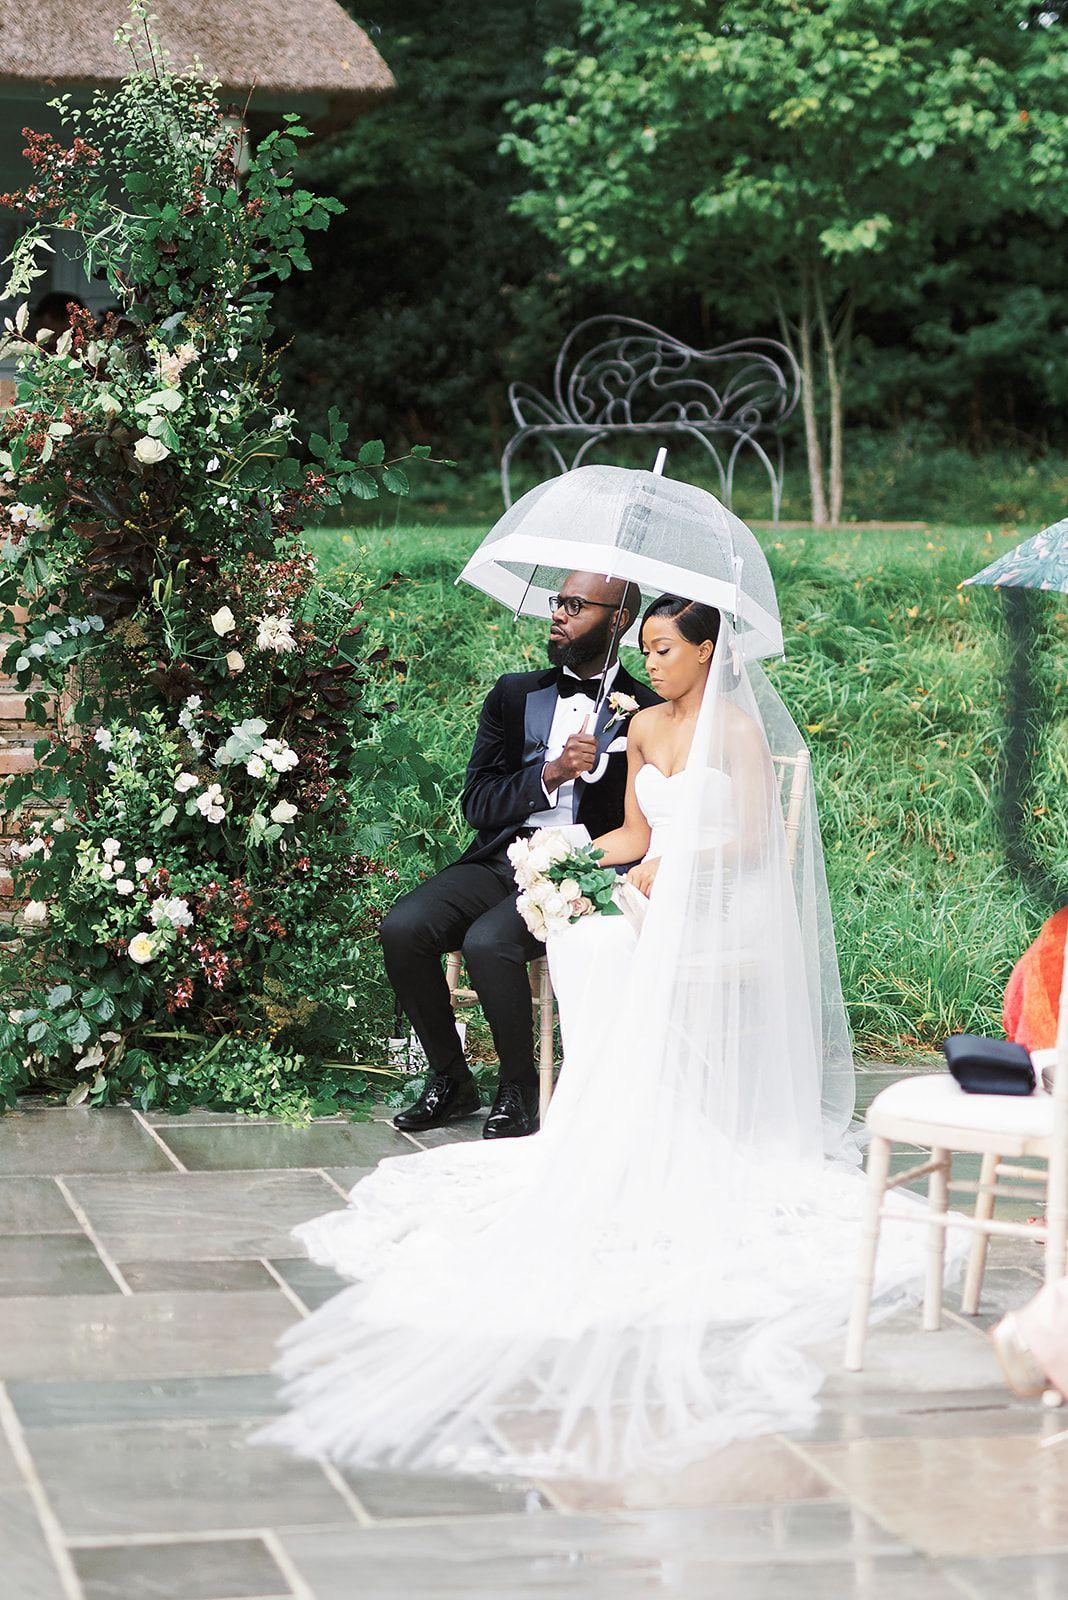 Outdoor Wedding Ceremony in the rain